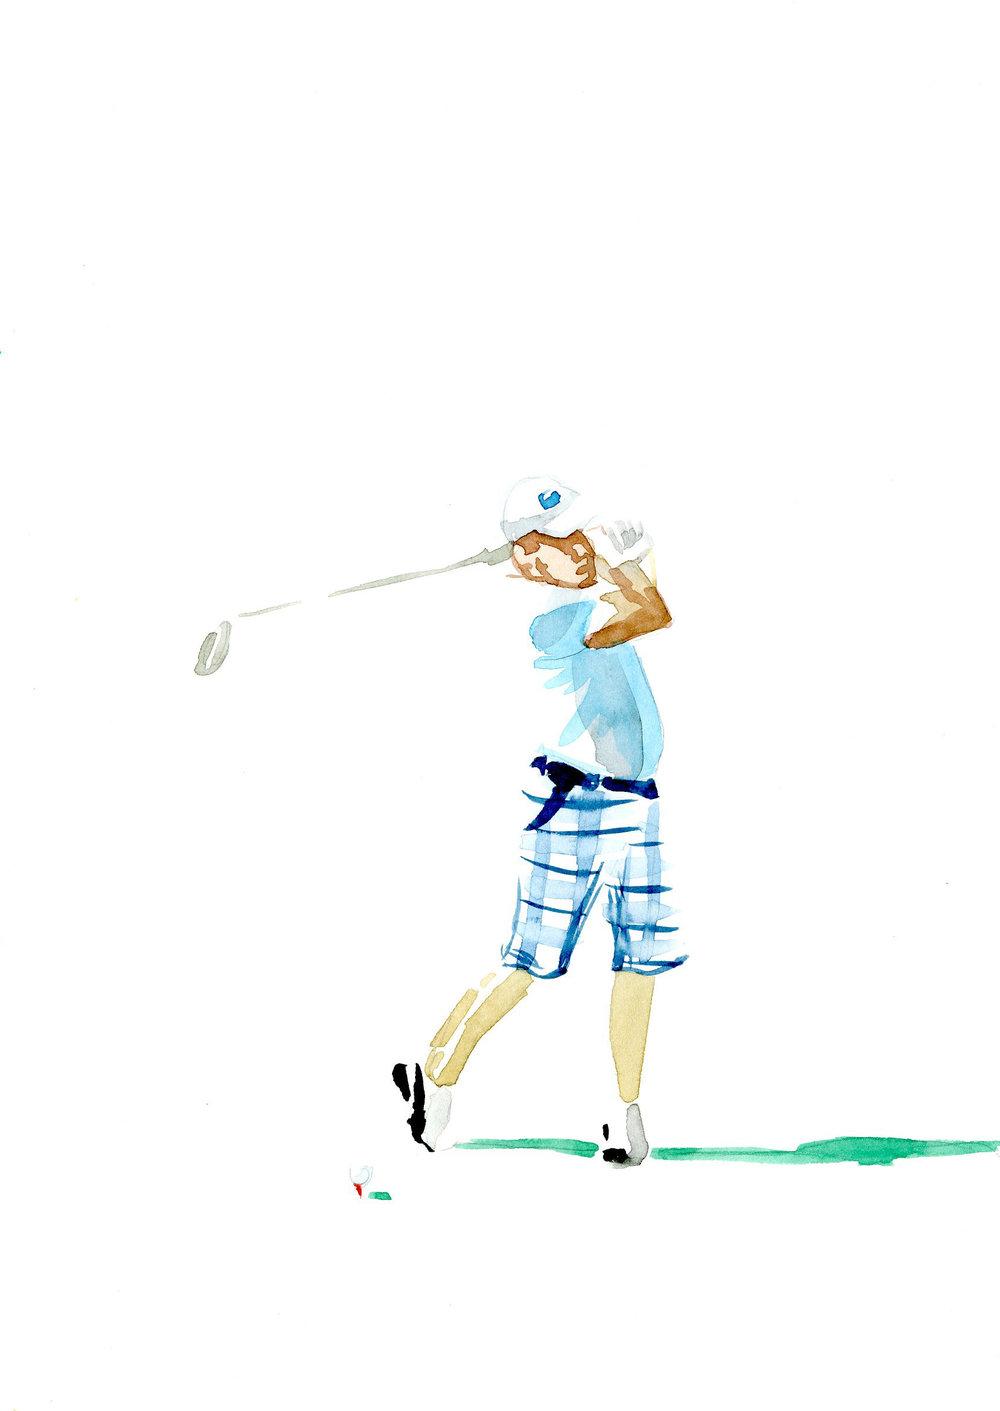 golf2017_22.jpg